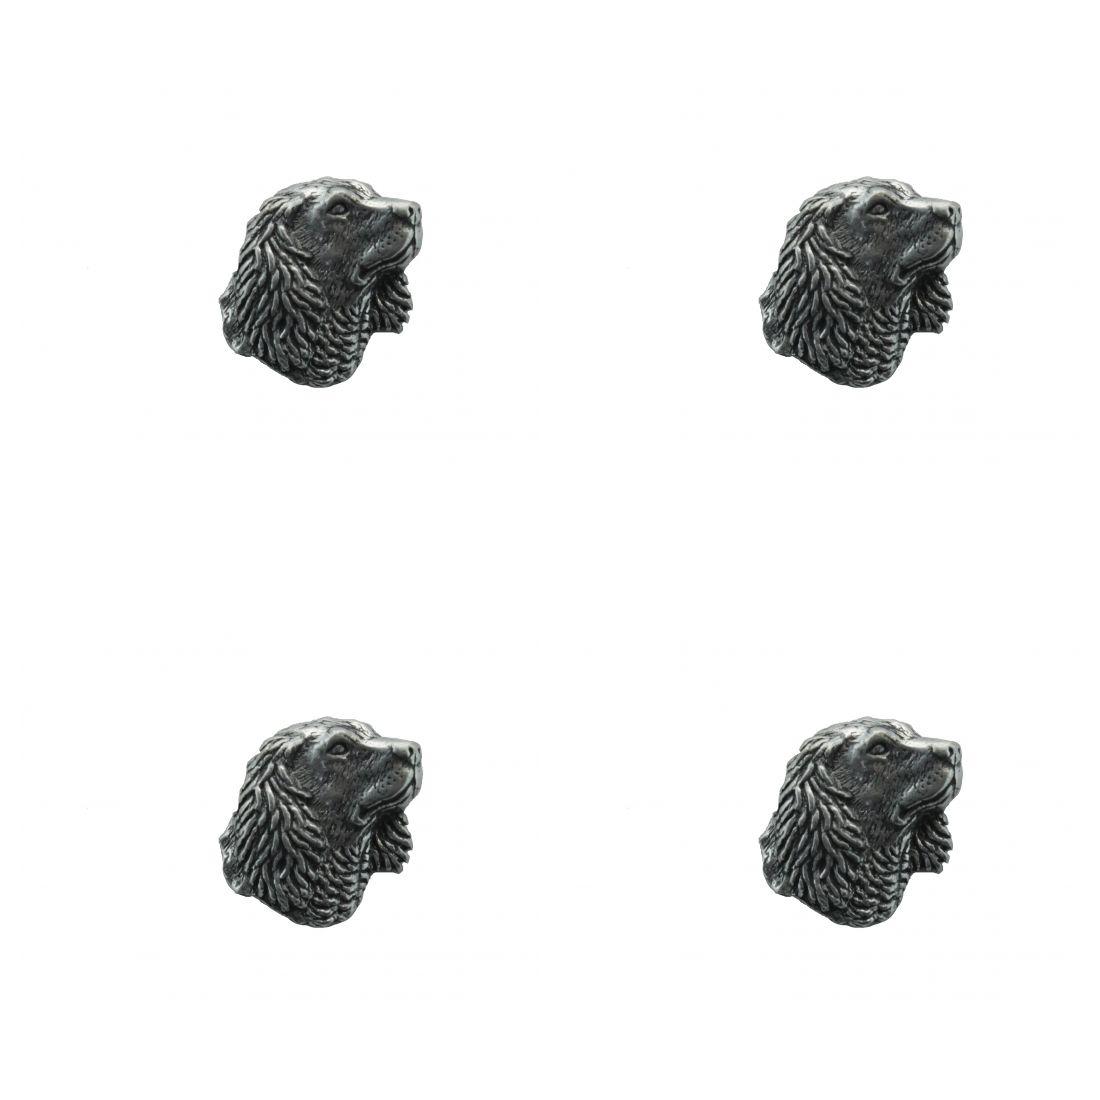 4x Pin Anstecker Badge Kopf Cockerspaniel klein, 2x1,9cm,